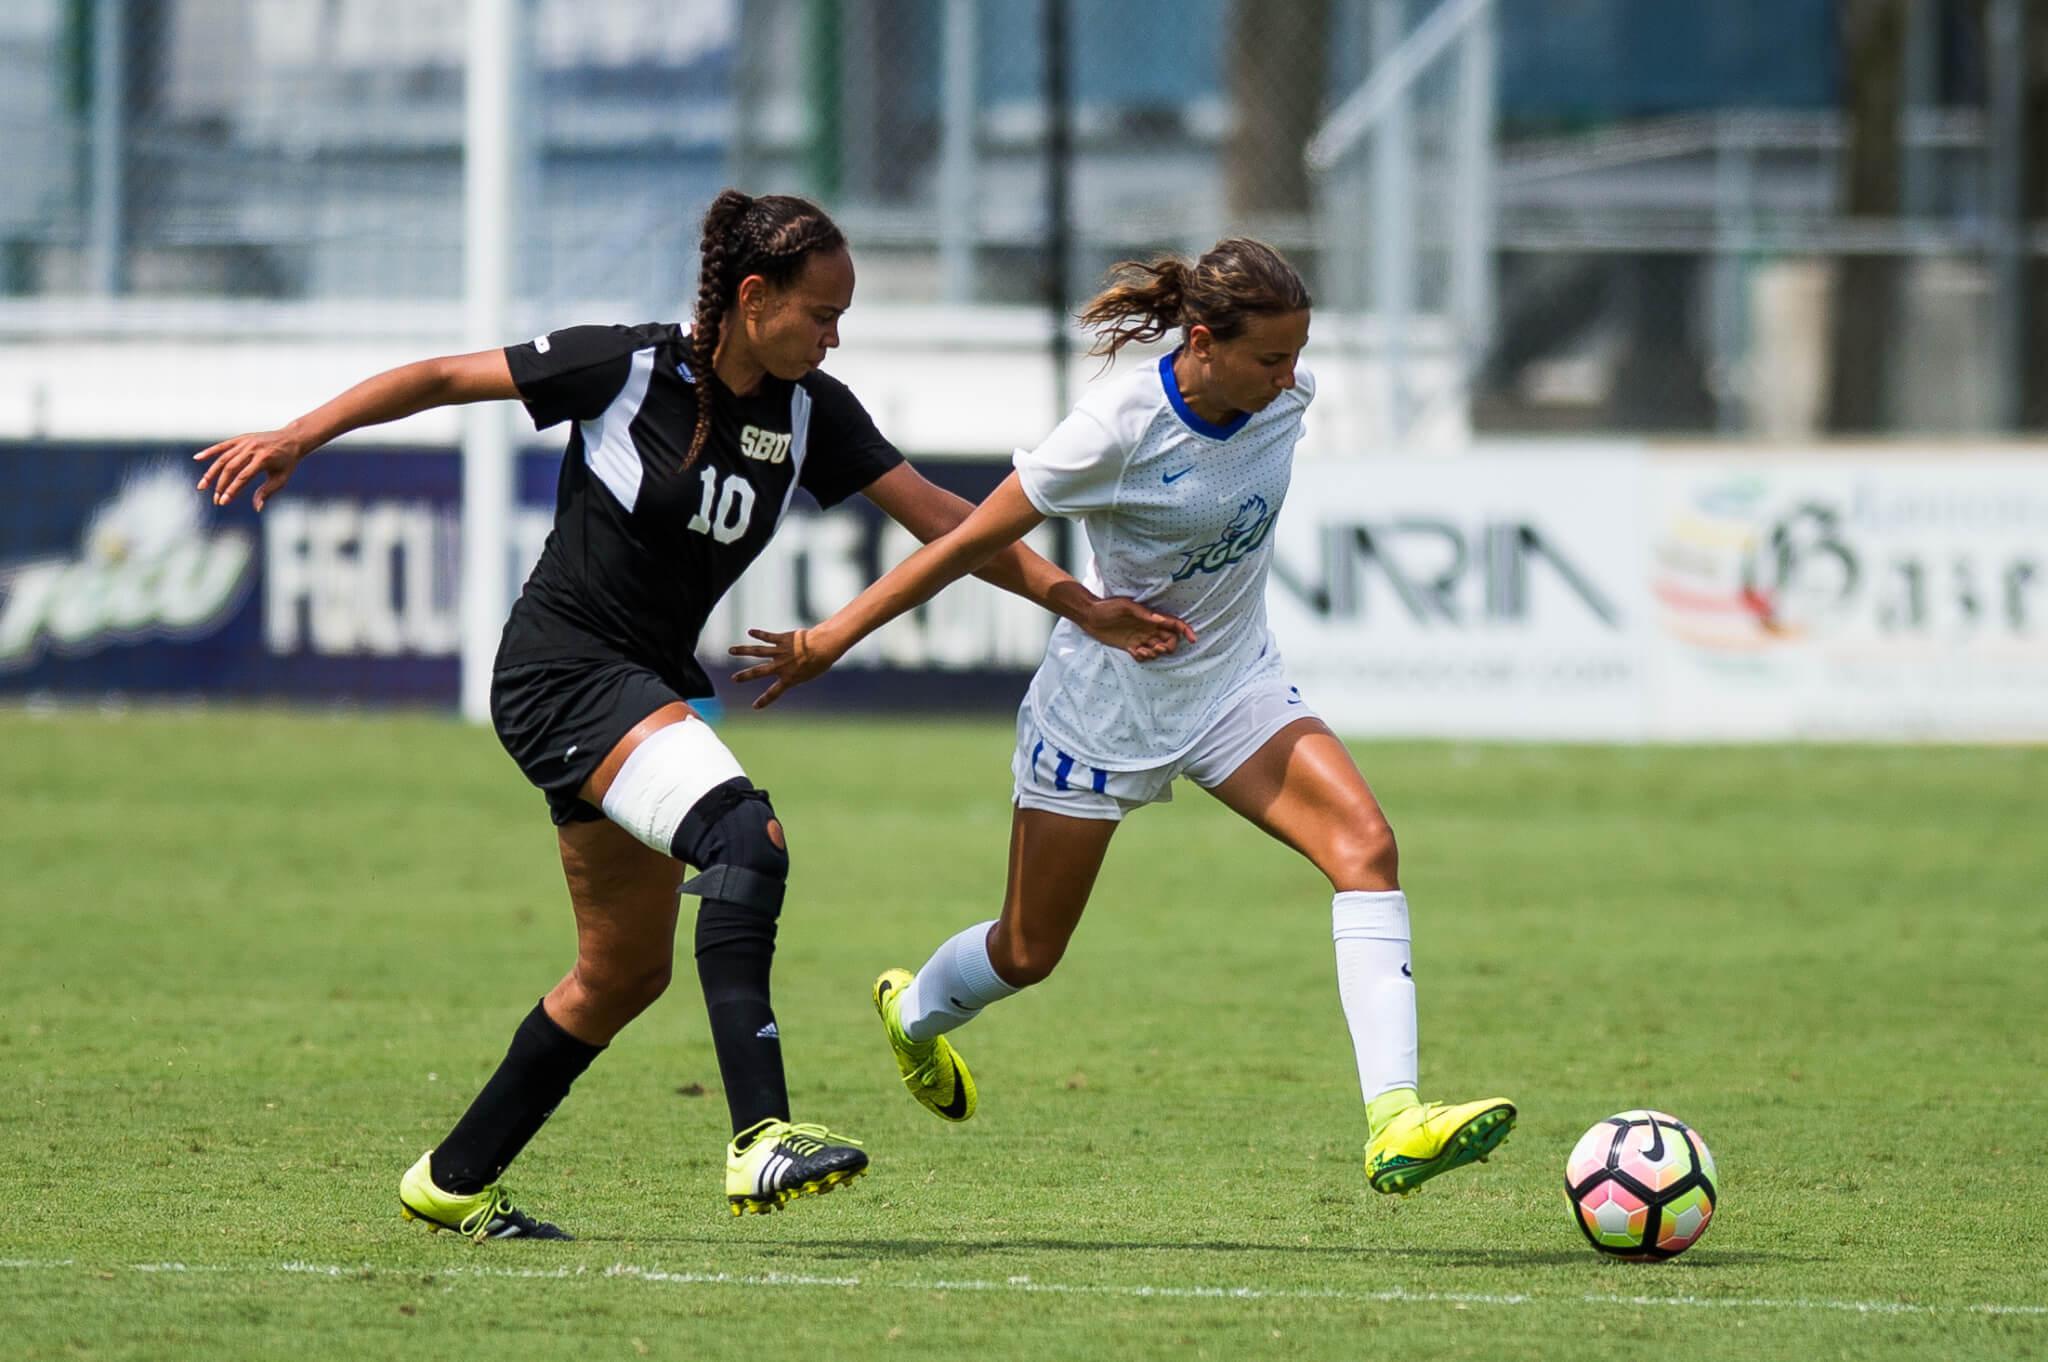 Preview: FGCU women's soccer vs. Fairleigh Dickinson